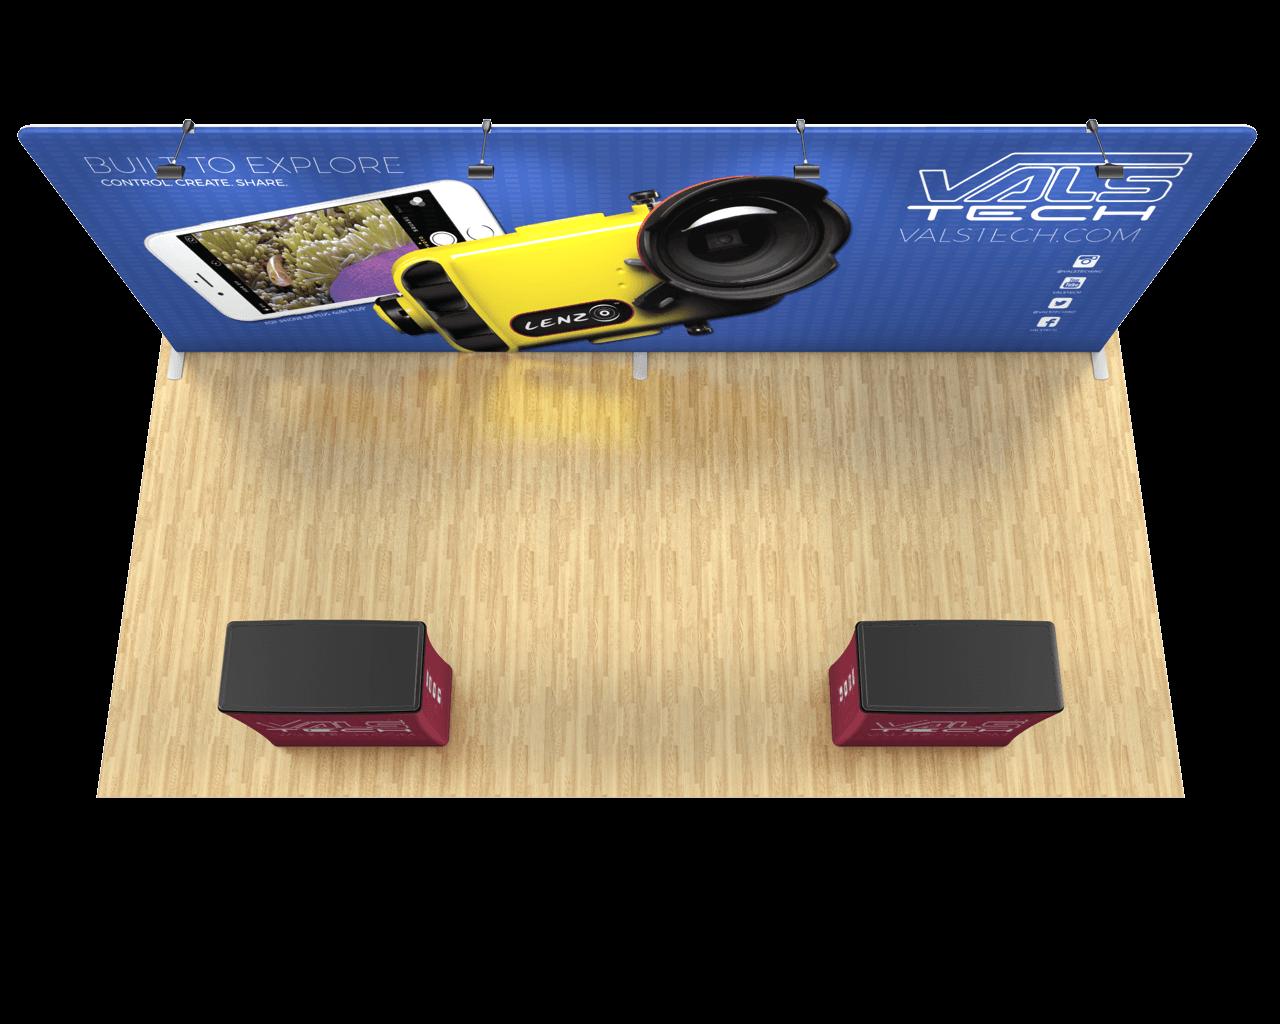 Waveline 20ft Flat Kit